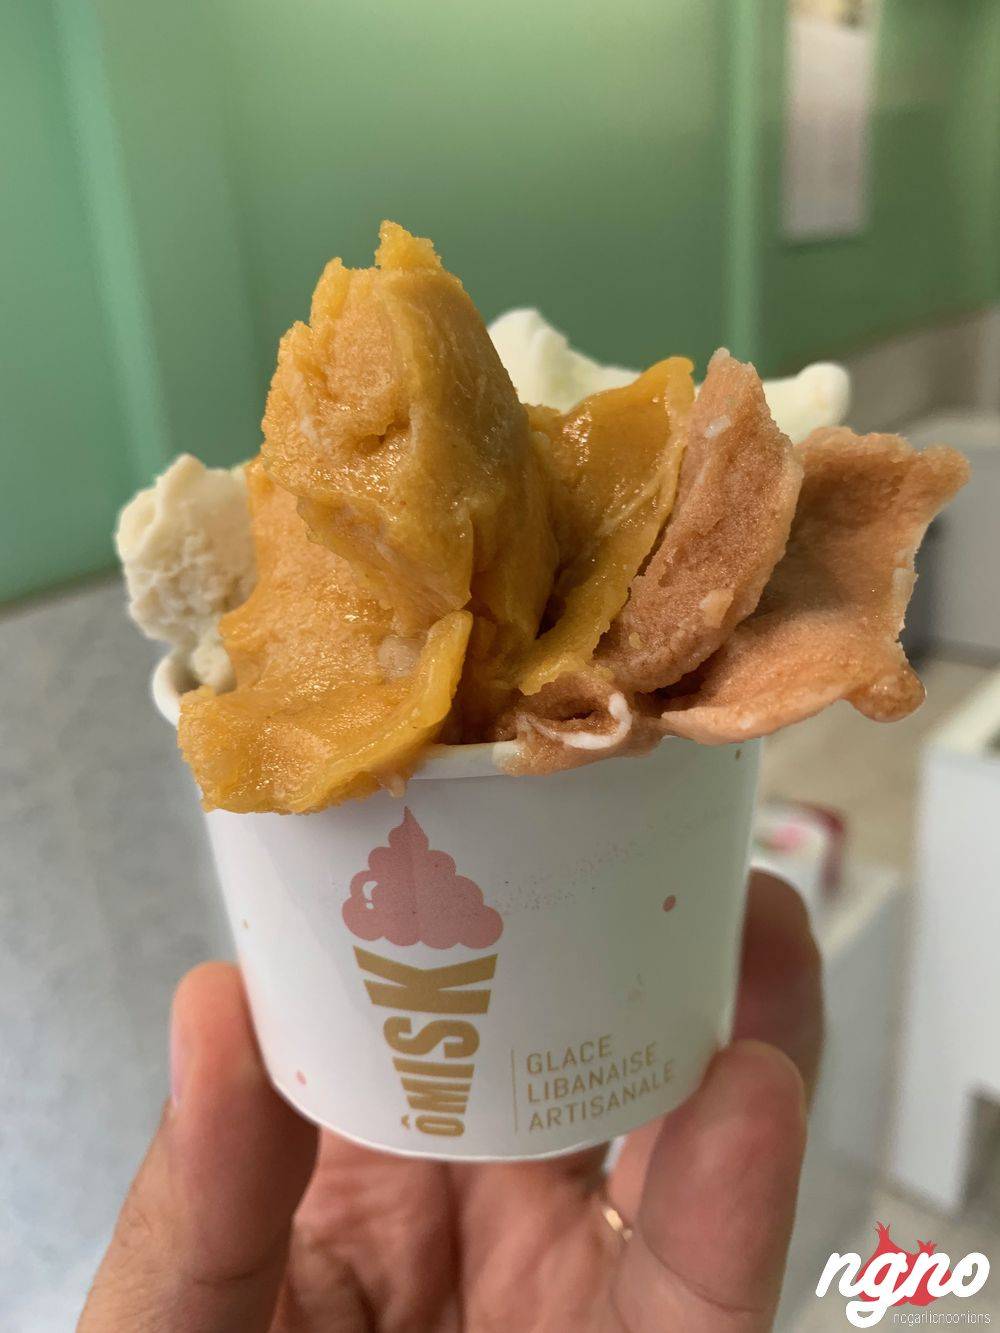 omisk-lebanese-ice-cream-paris-nogarlicnoonions-52019-04-17-06-36-39